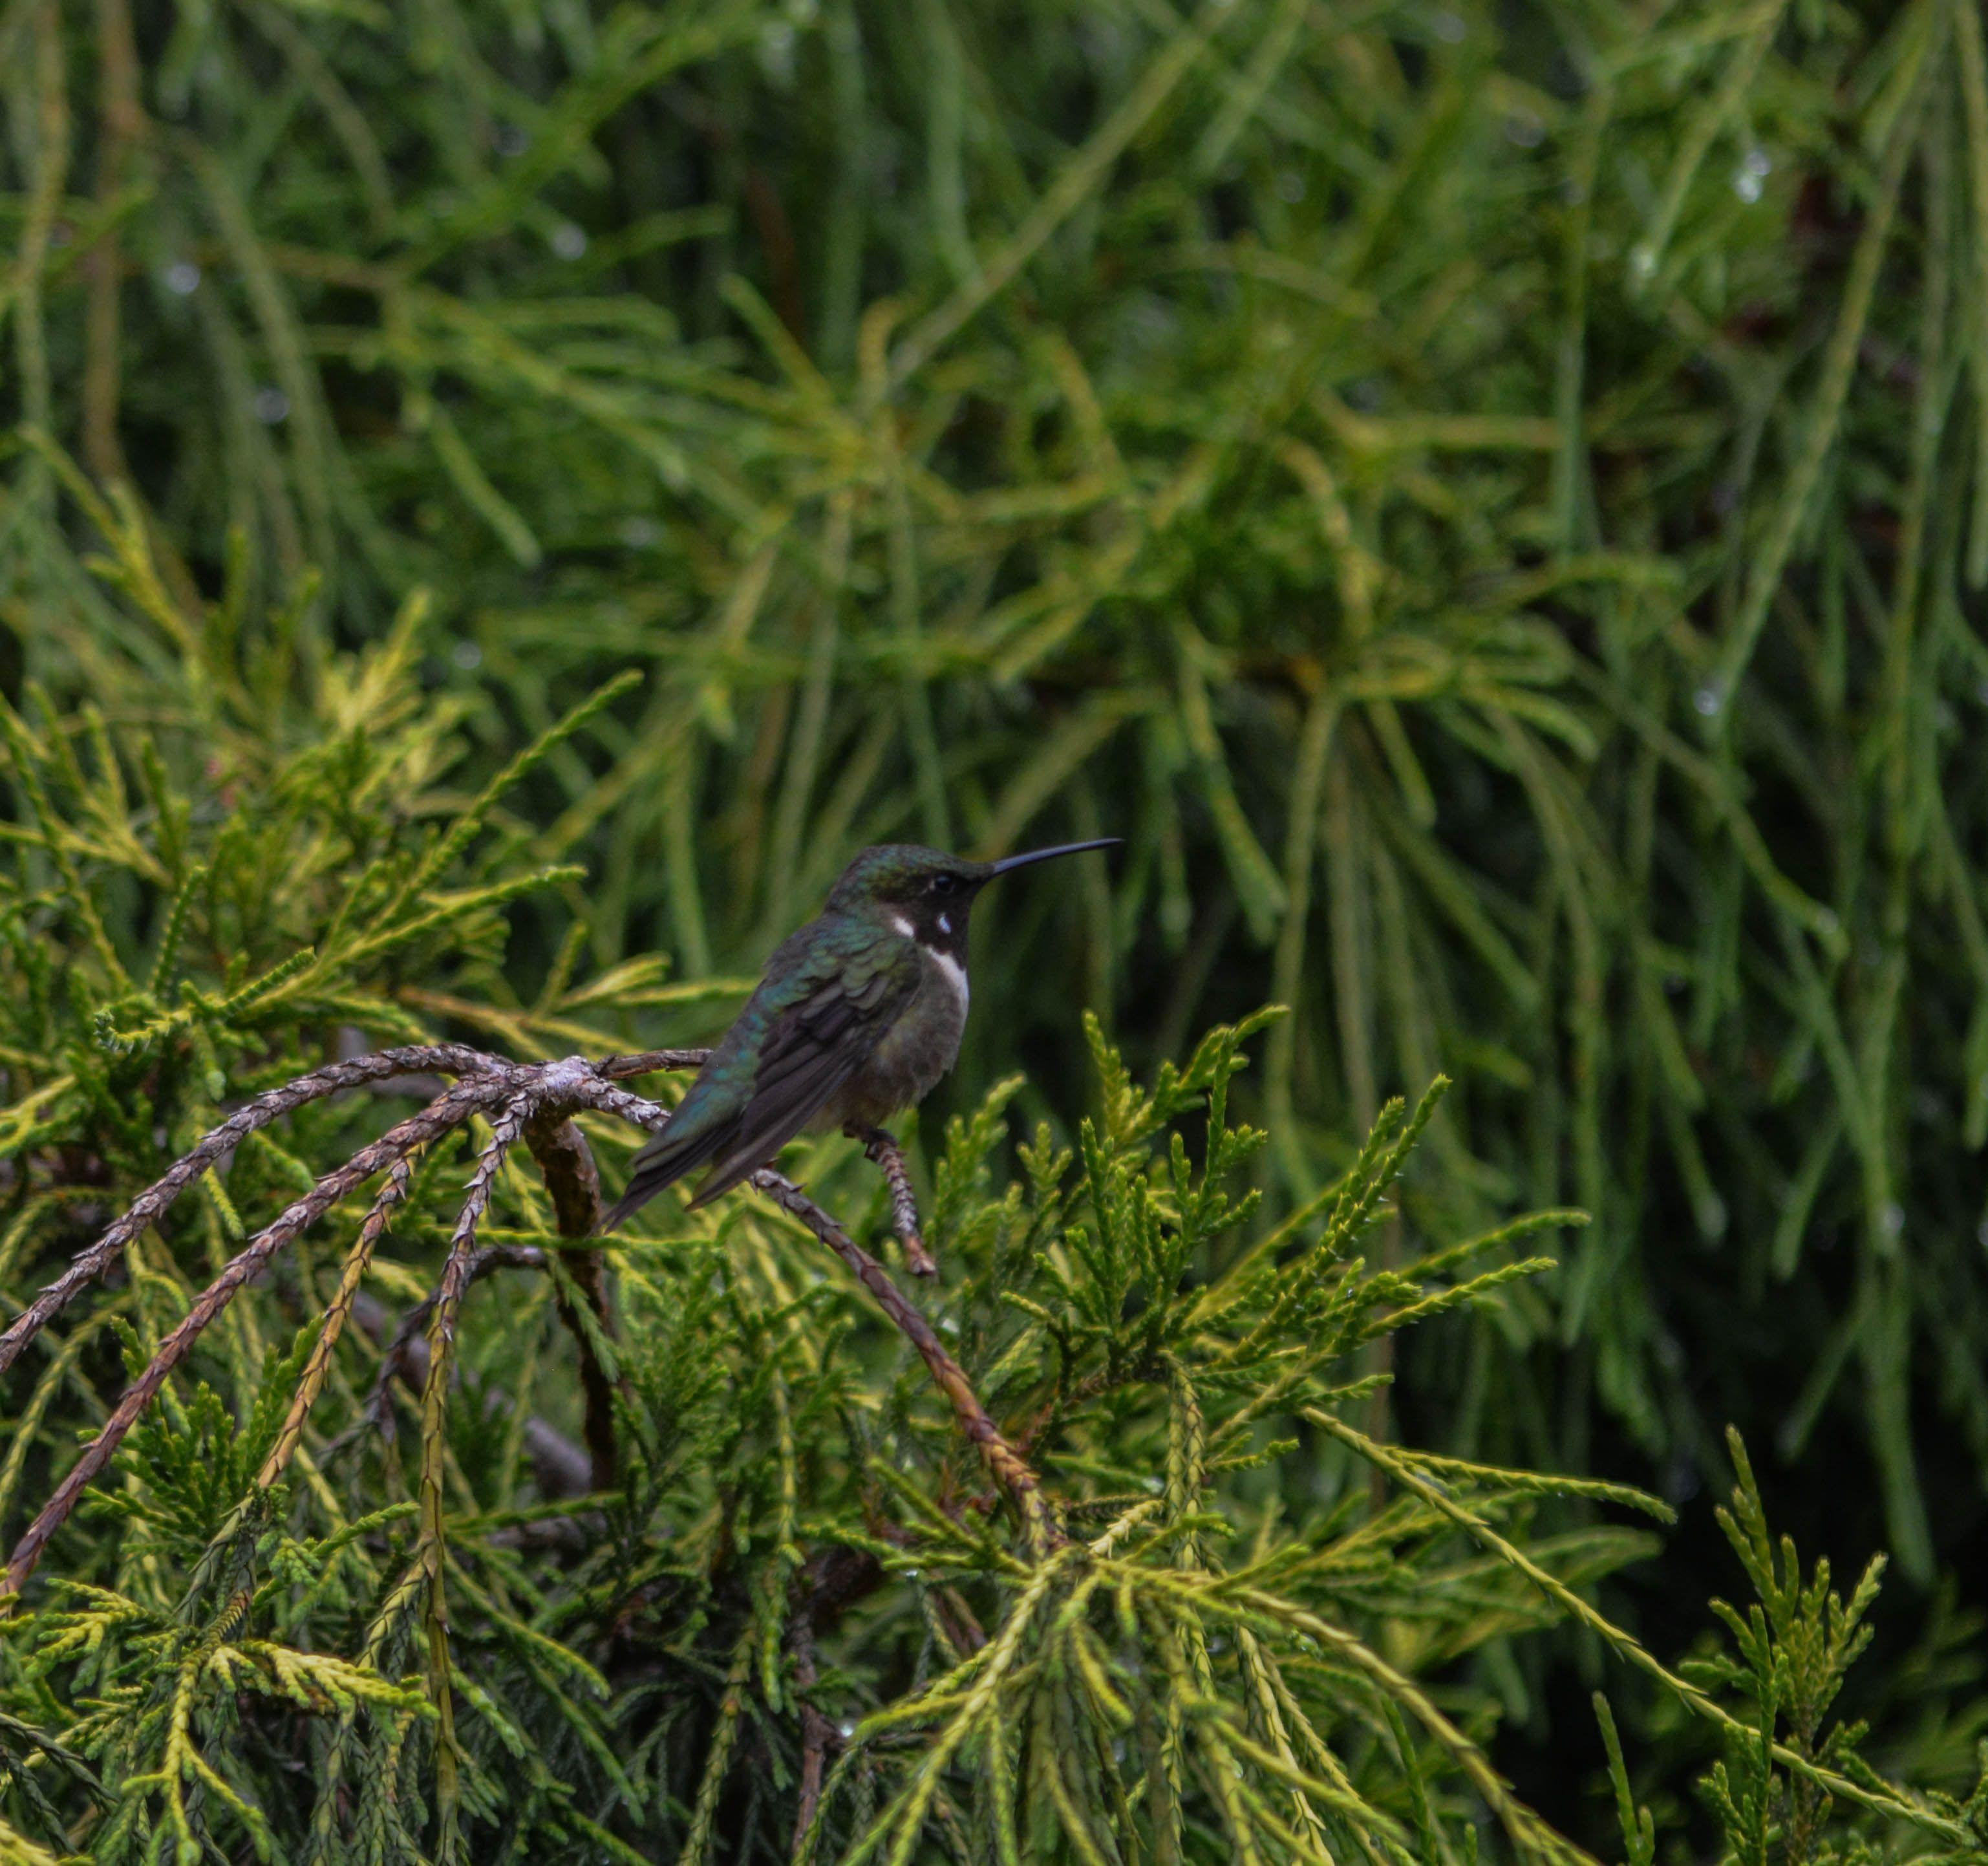 Hummingbird-in-tree